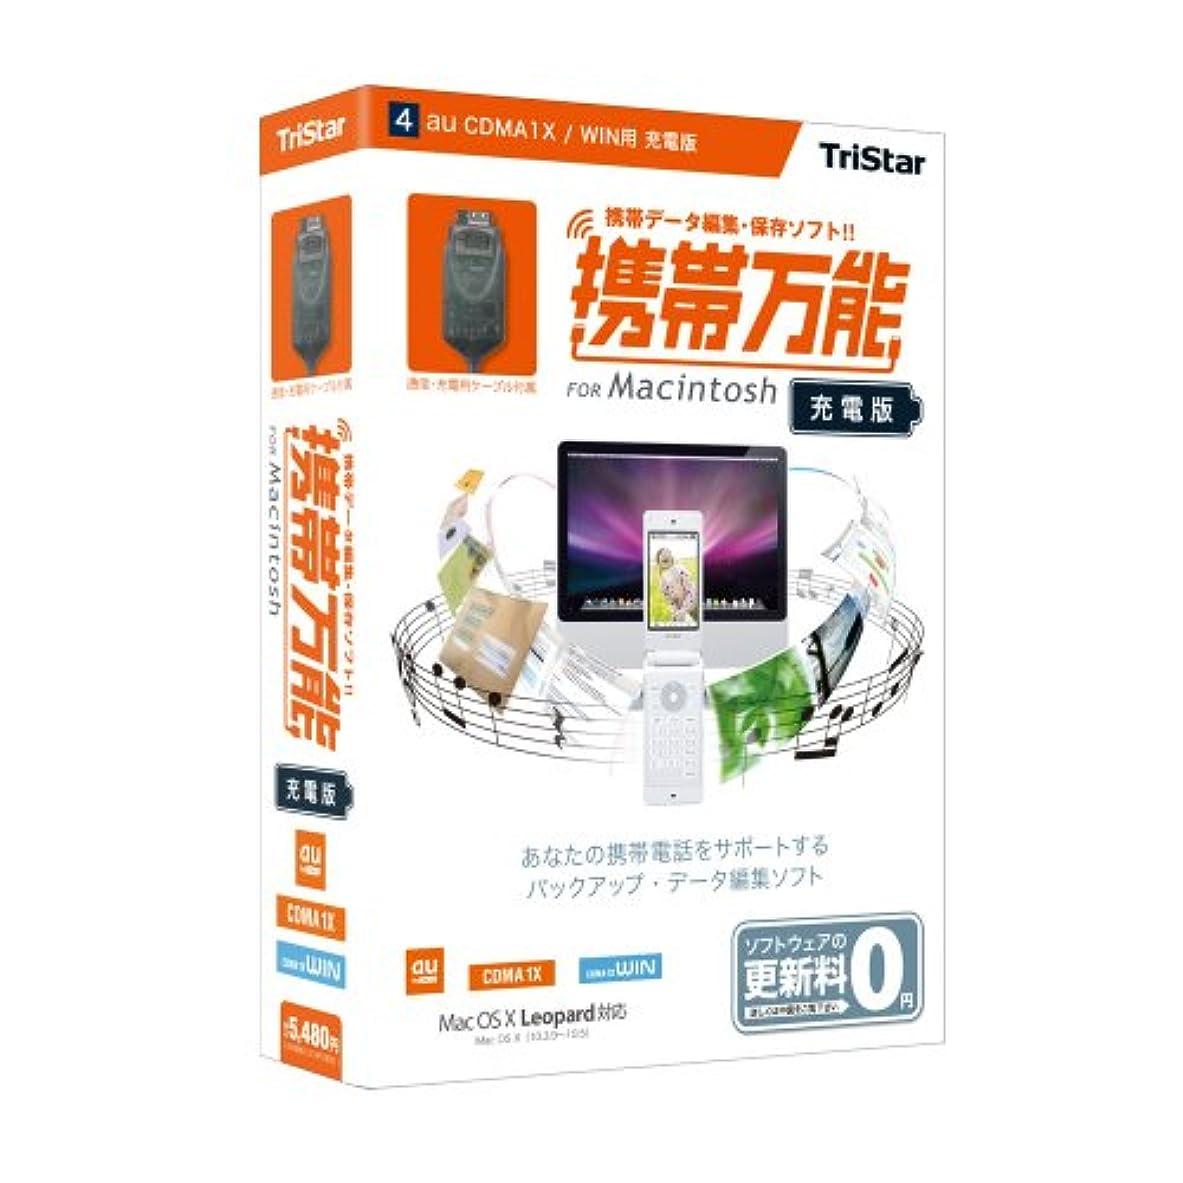 蘇生する統計的隣接携帯万能 for Macintosh au CDMA1X / WIN用 充電版